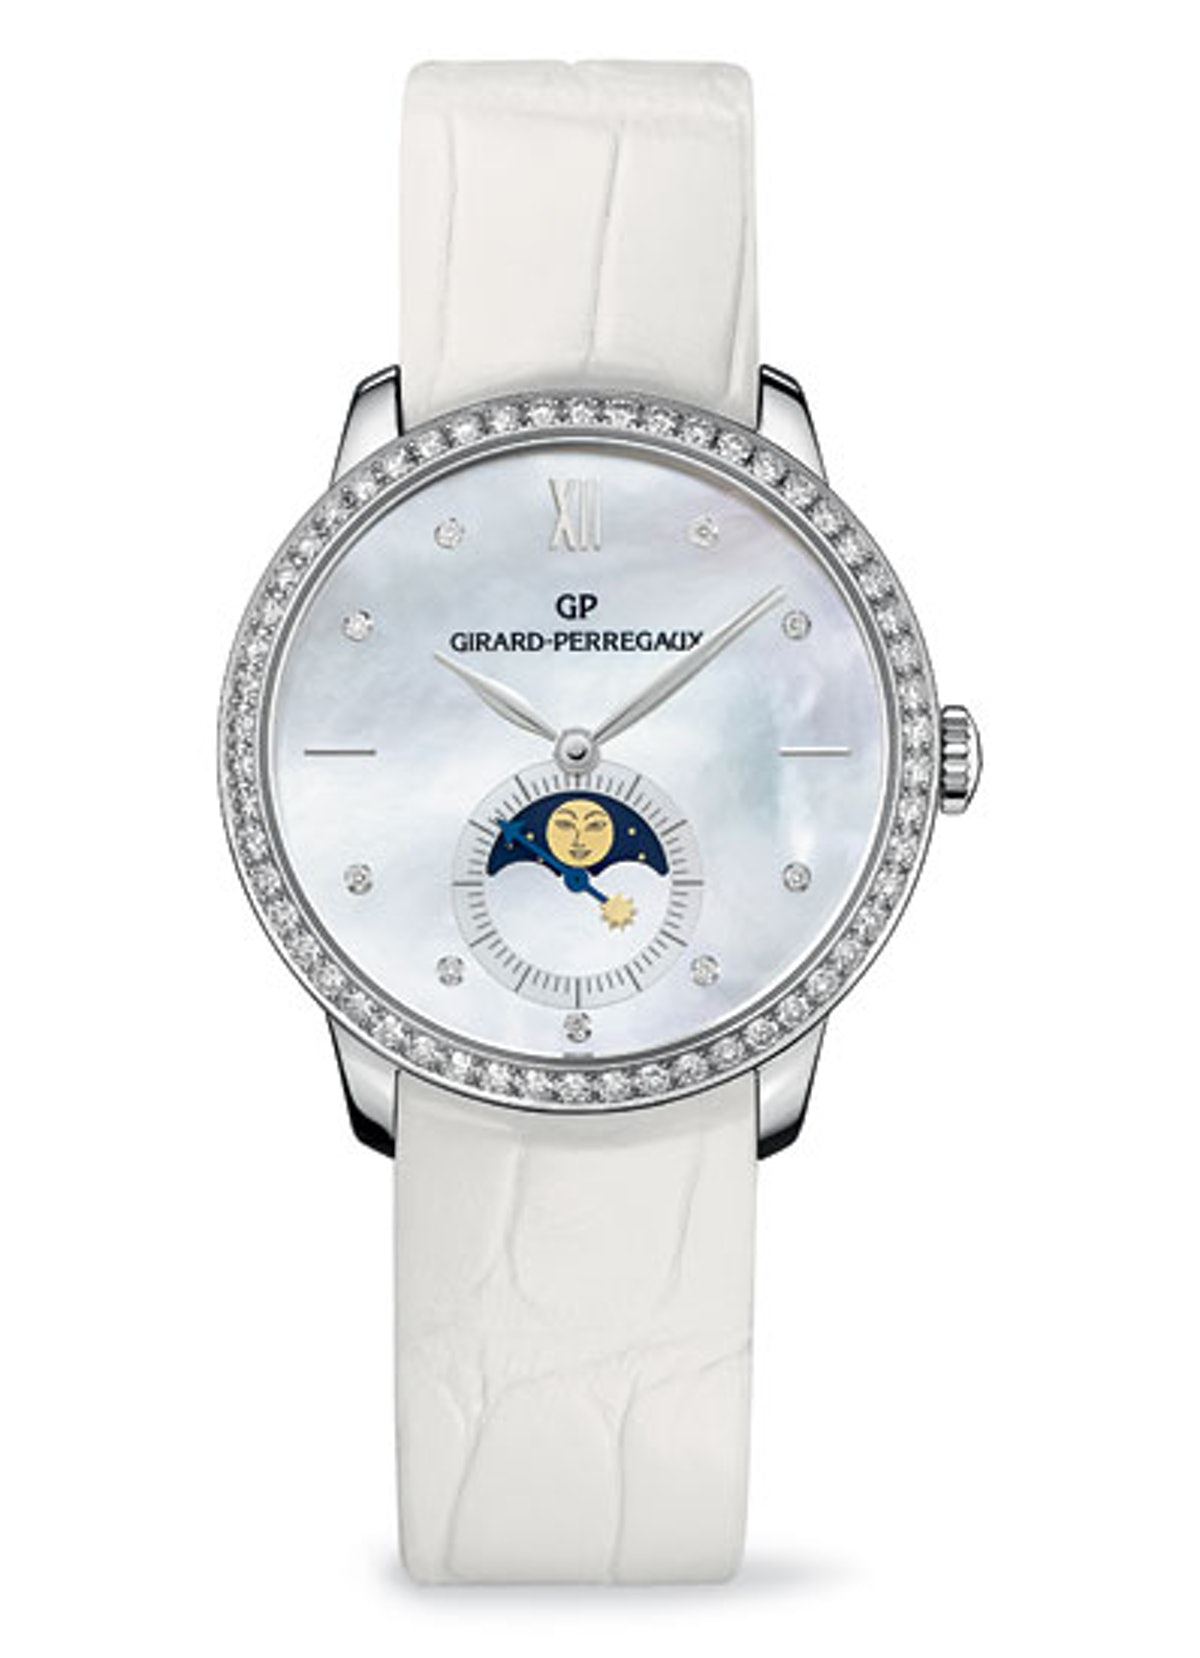 acss-geneva-watches-12-v.jpg